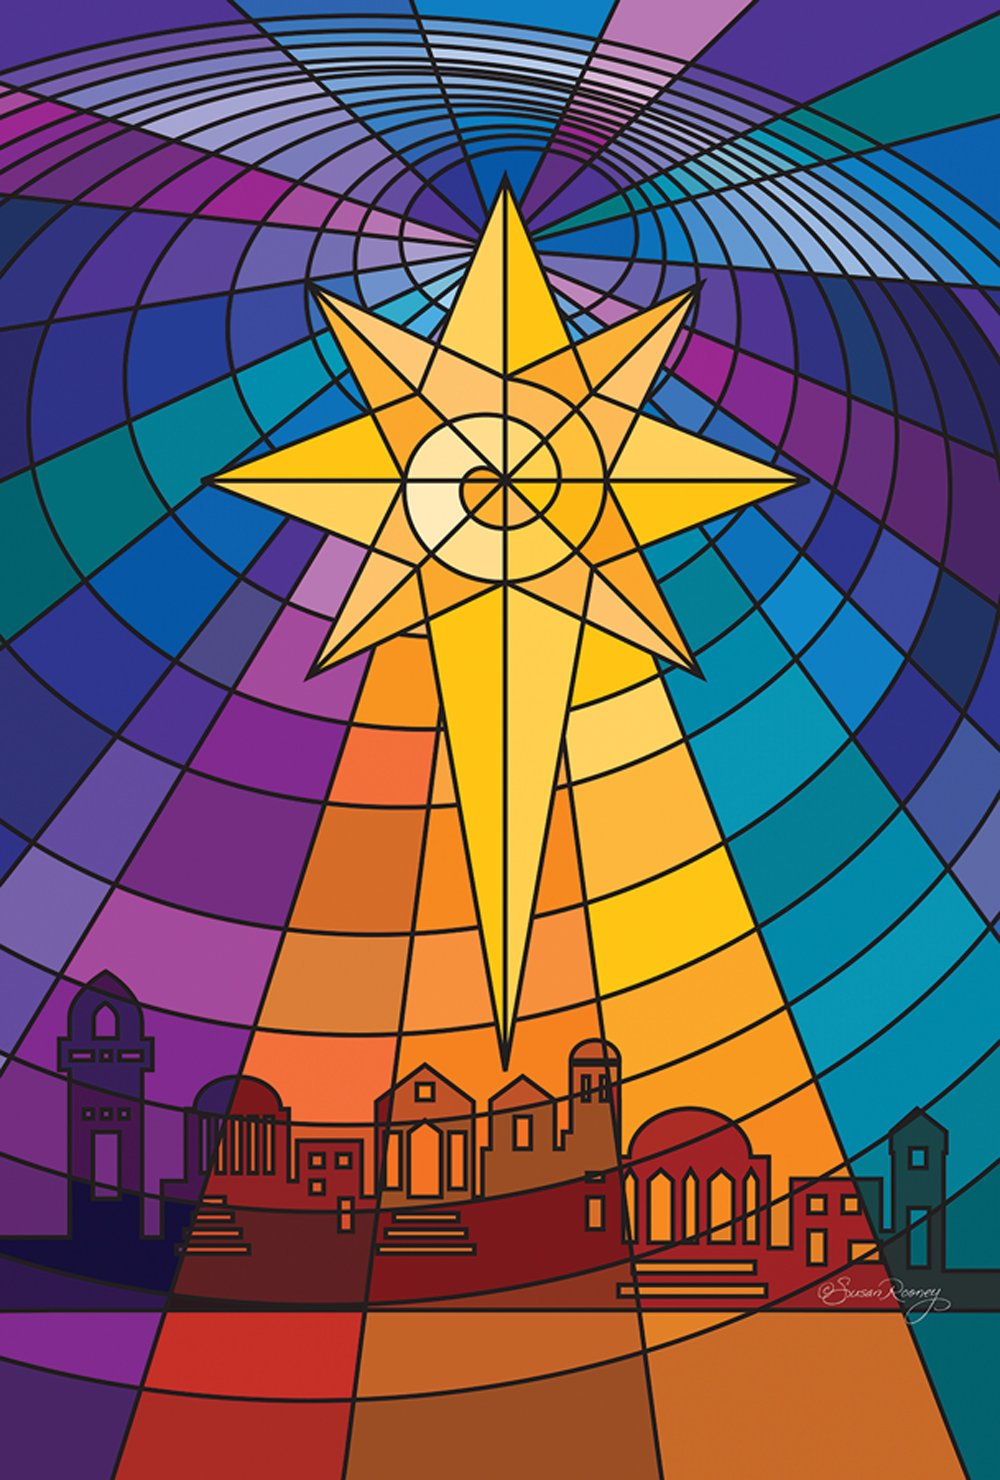 Toland Home Garden Star Of Bethlehem 12.5 x 18 Inch Decorative Stained Glass Christmas Garden Flag